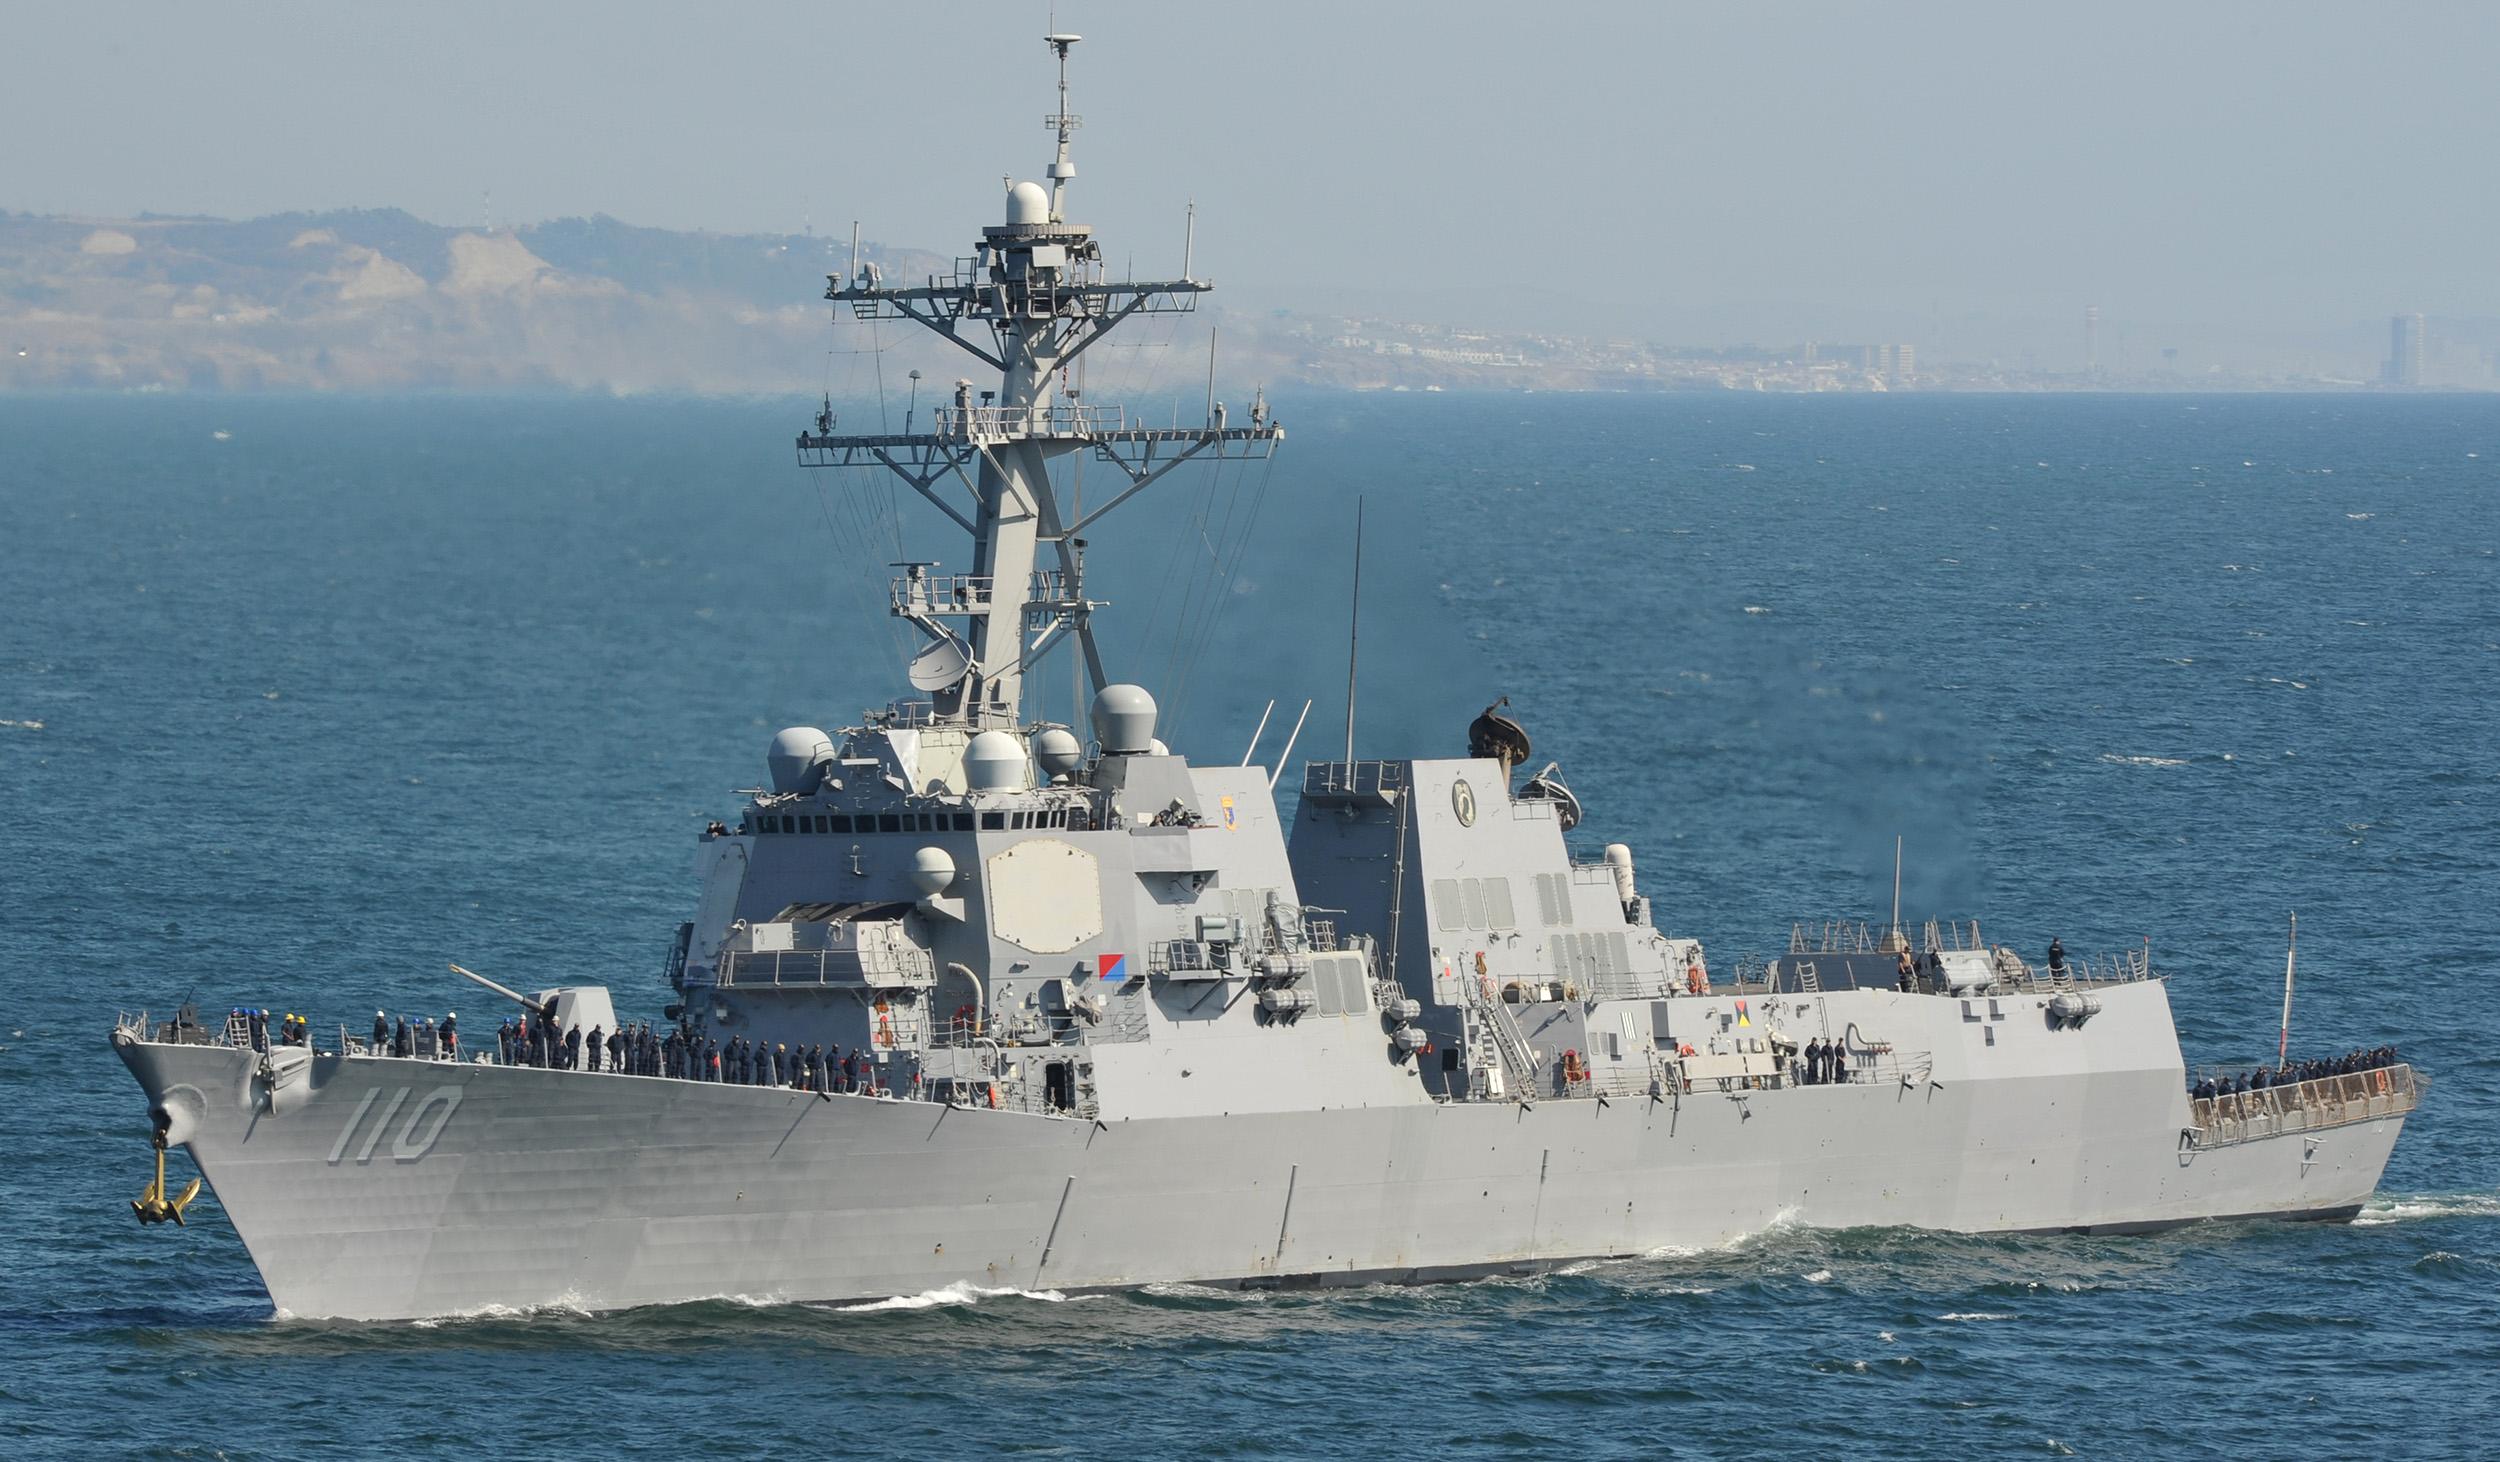 USS_William_P._Lawrence_%28DDG_110%29_steams_toward_San_Diego_Harbor_in_May_2015.jpg